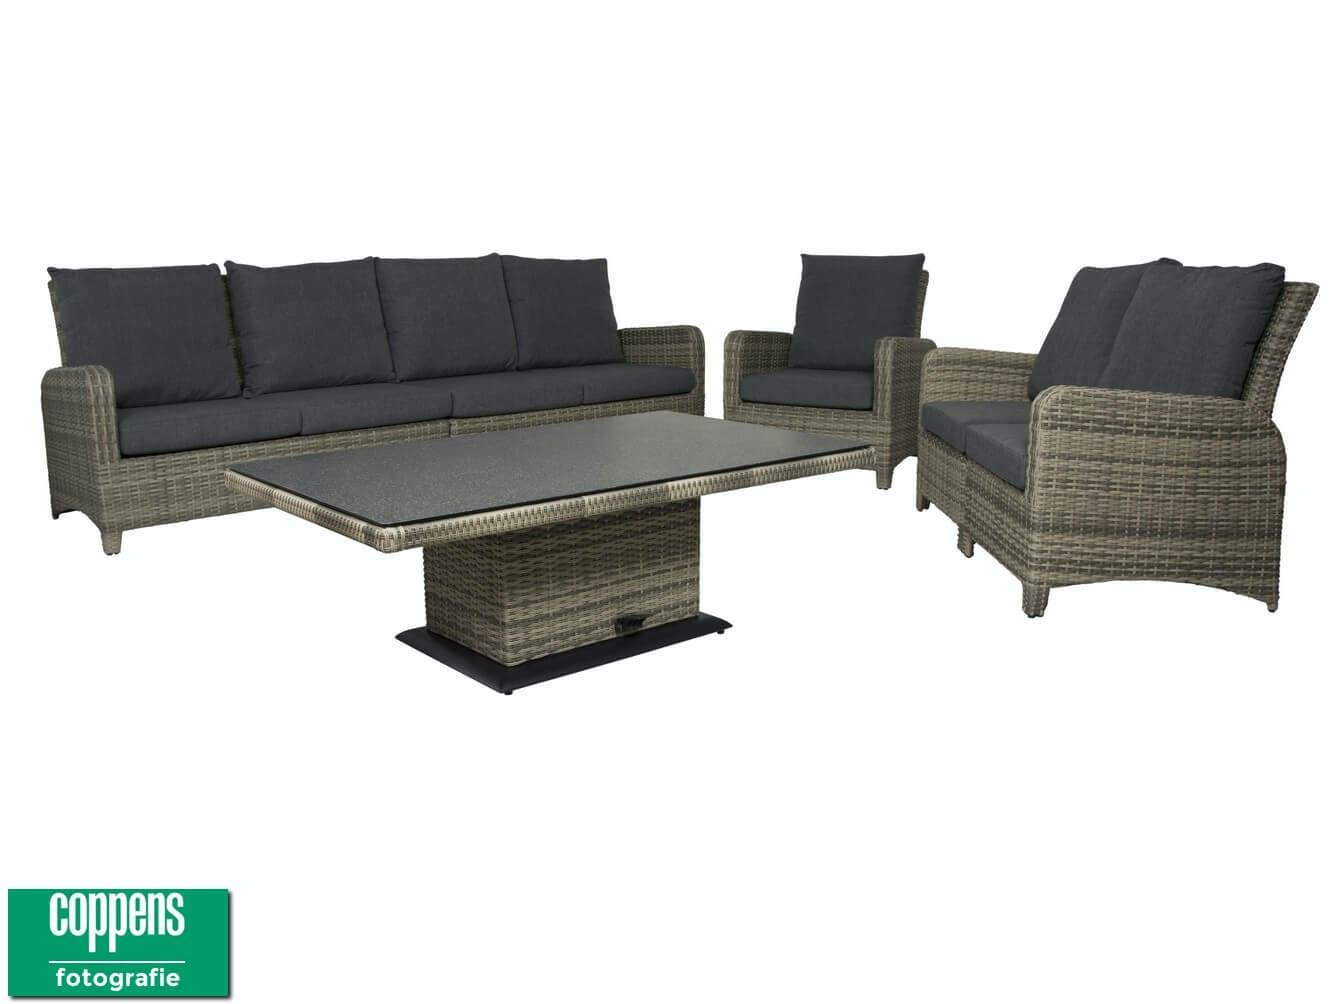 Aruba lounge dining set 4-zits + 2 zits + stoel en vario tafel 140